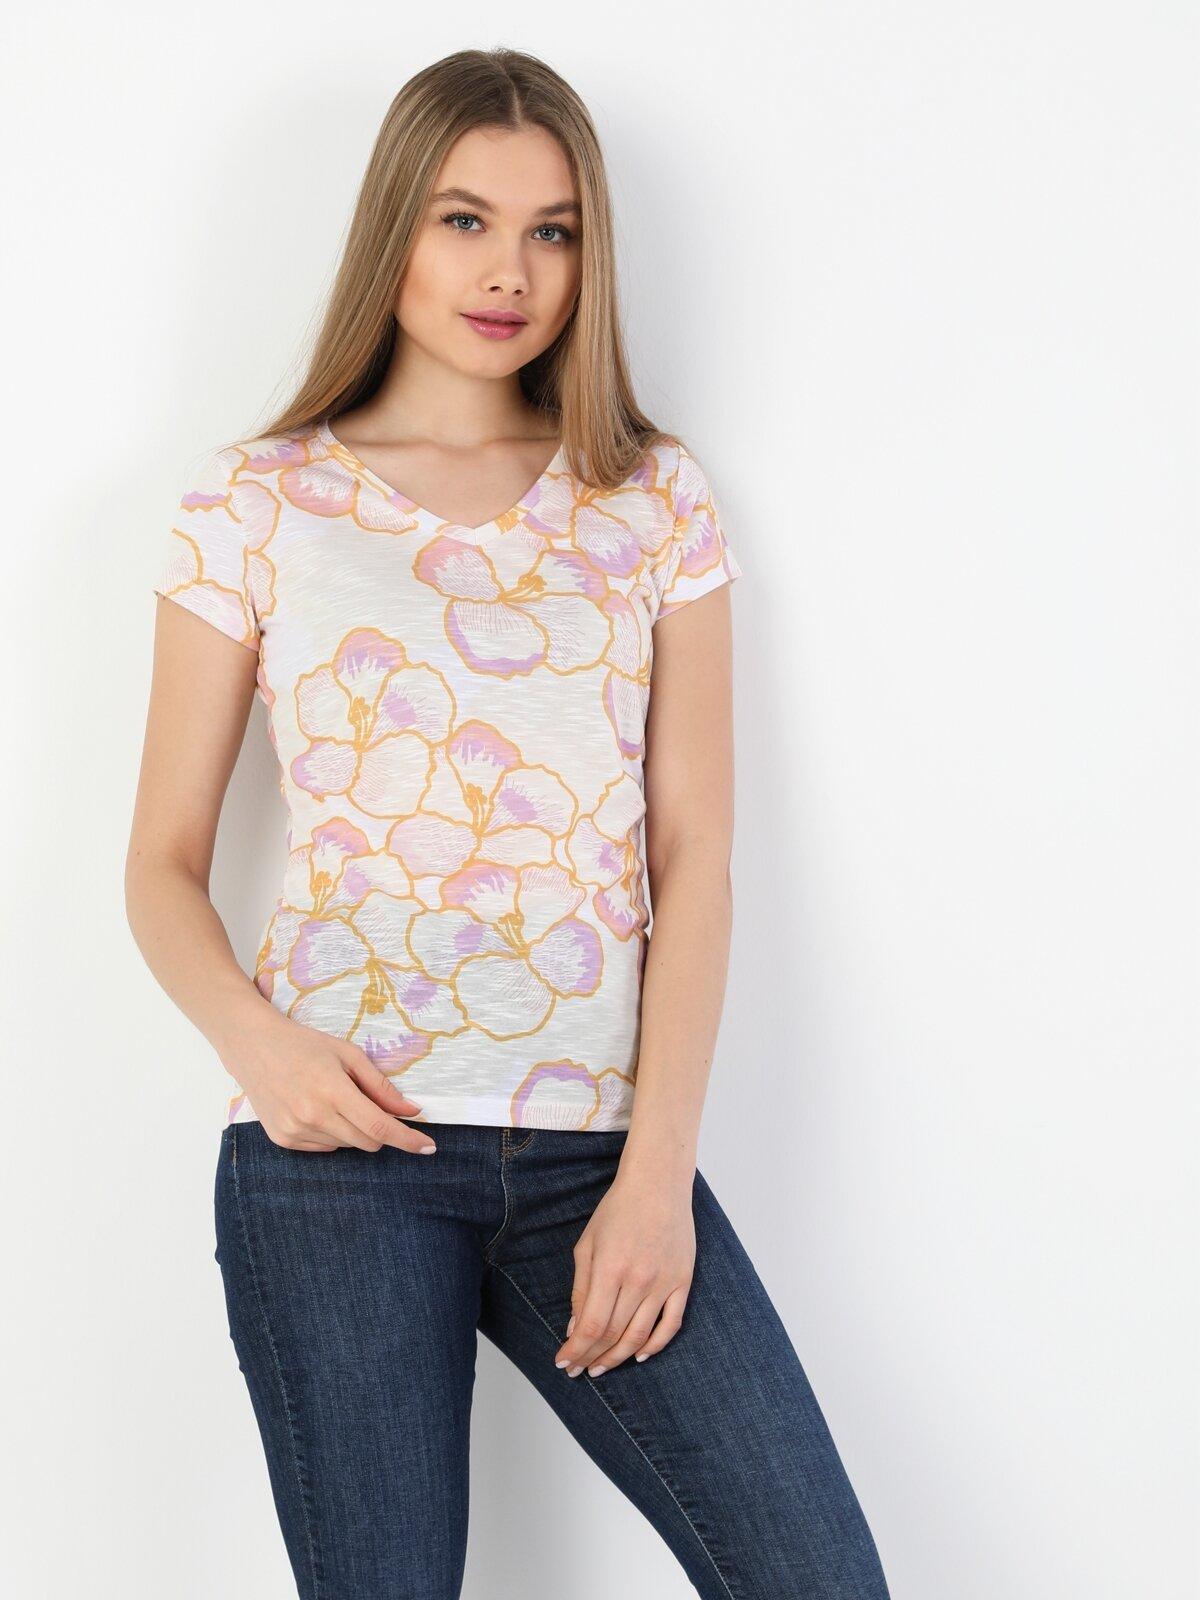 Slim Fit V Yaka Kadın Çok Renkli Kısa Kol Tişört